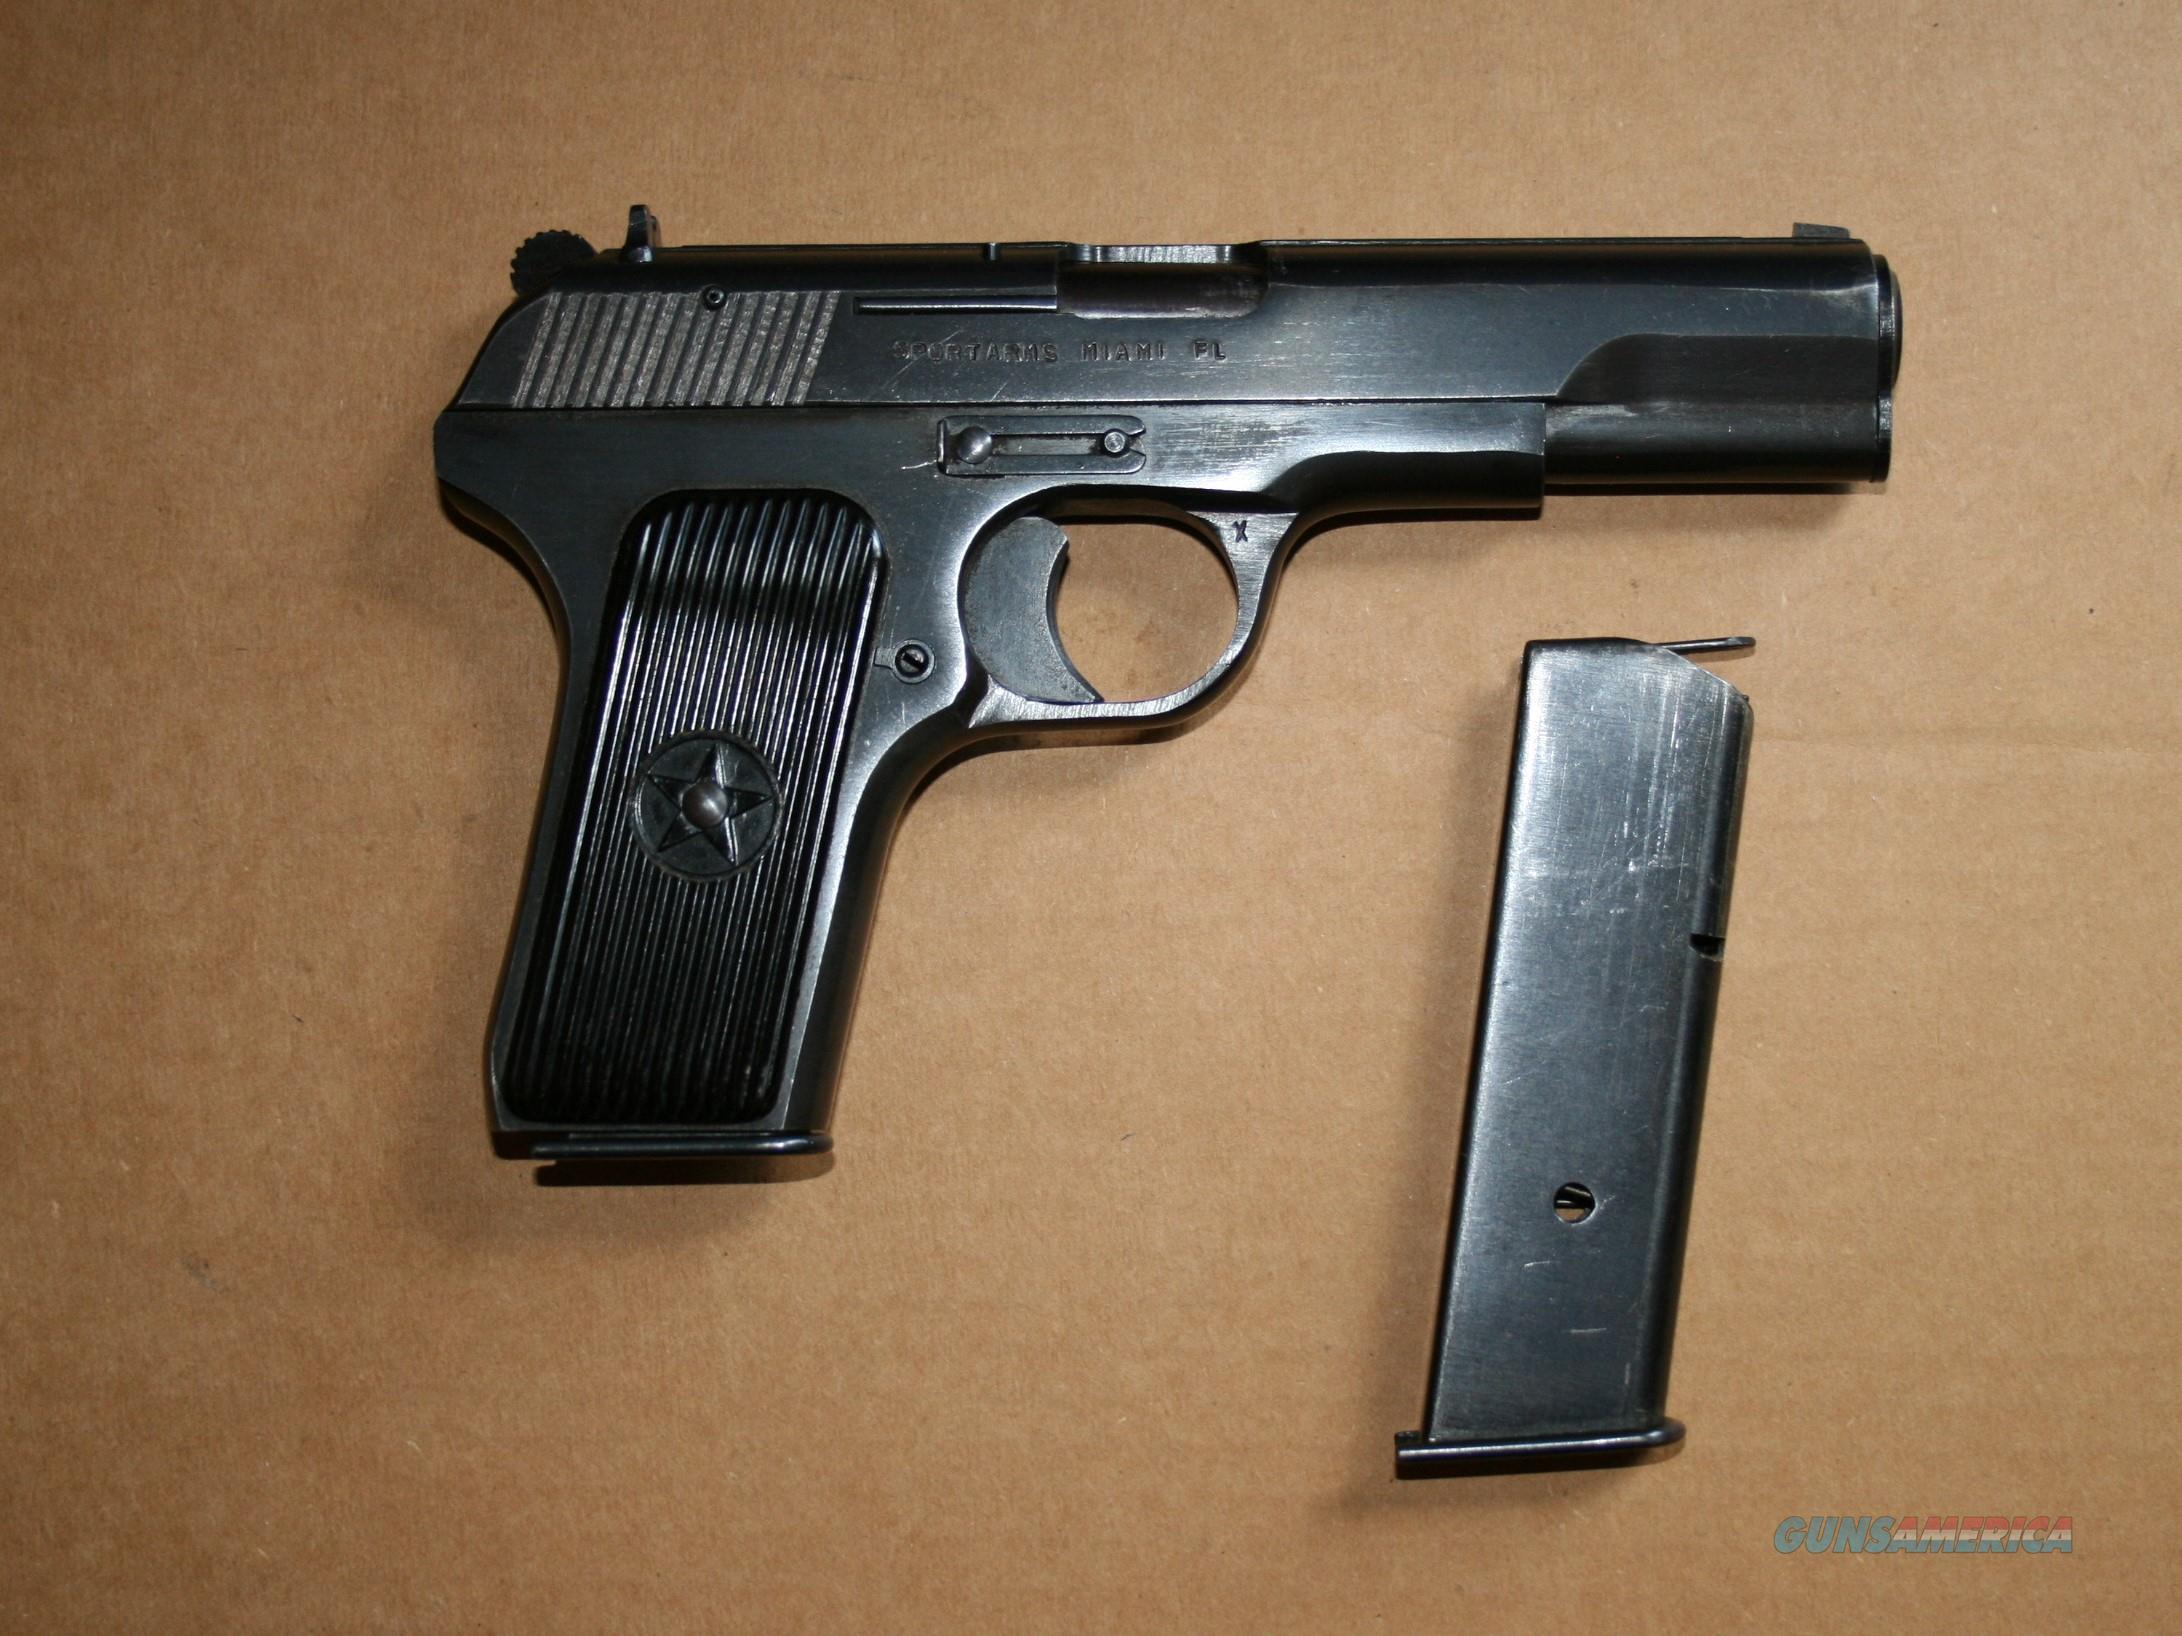 Norinco Chinese Tokarev Model 213 Pistol 9mm  Guns > Pistols > Norinco Pistols